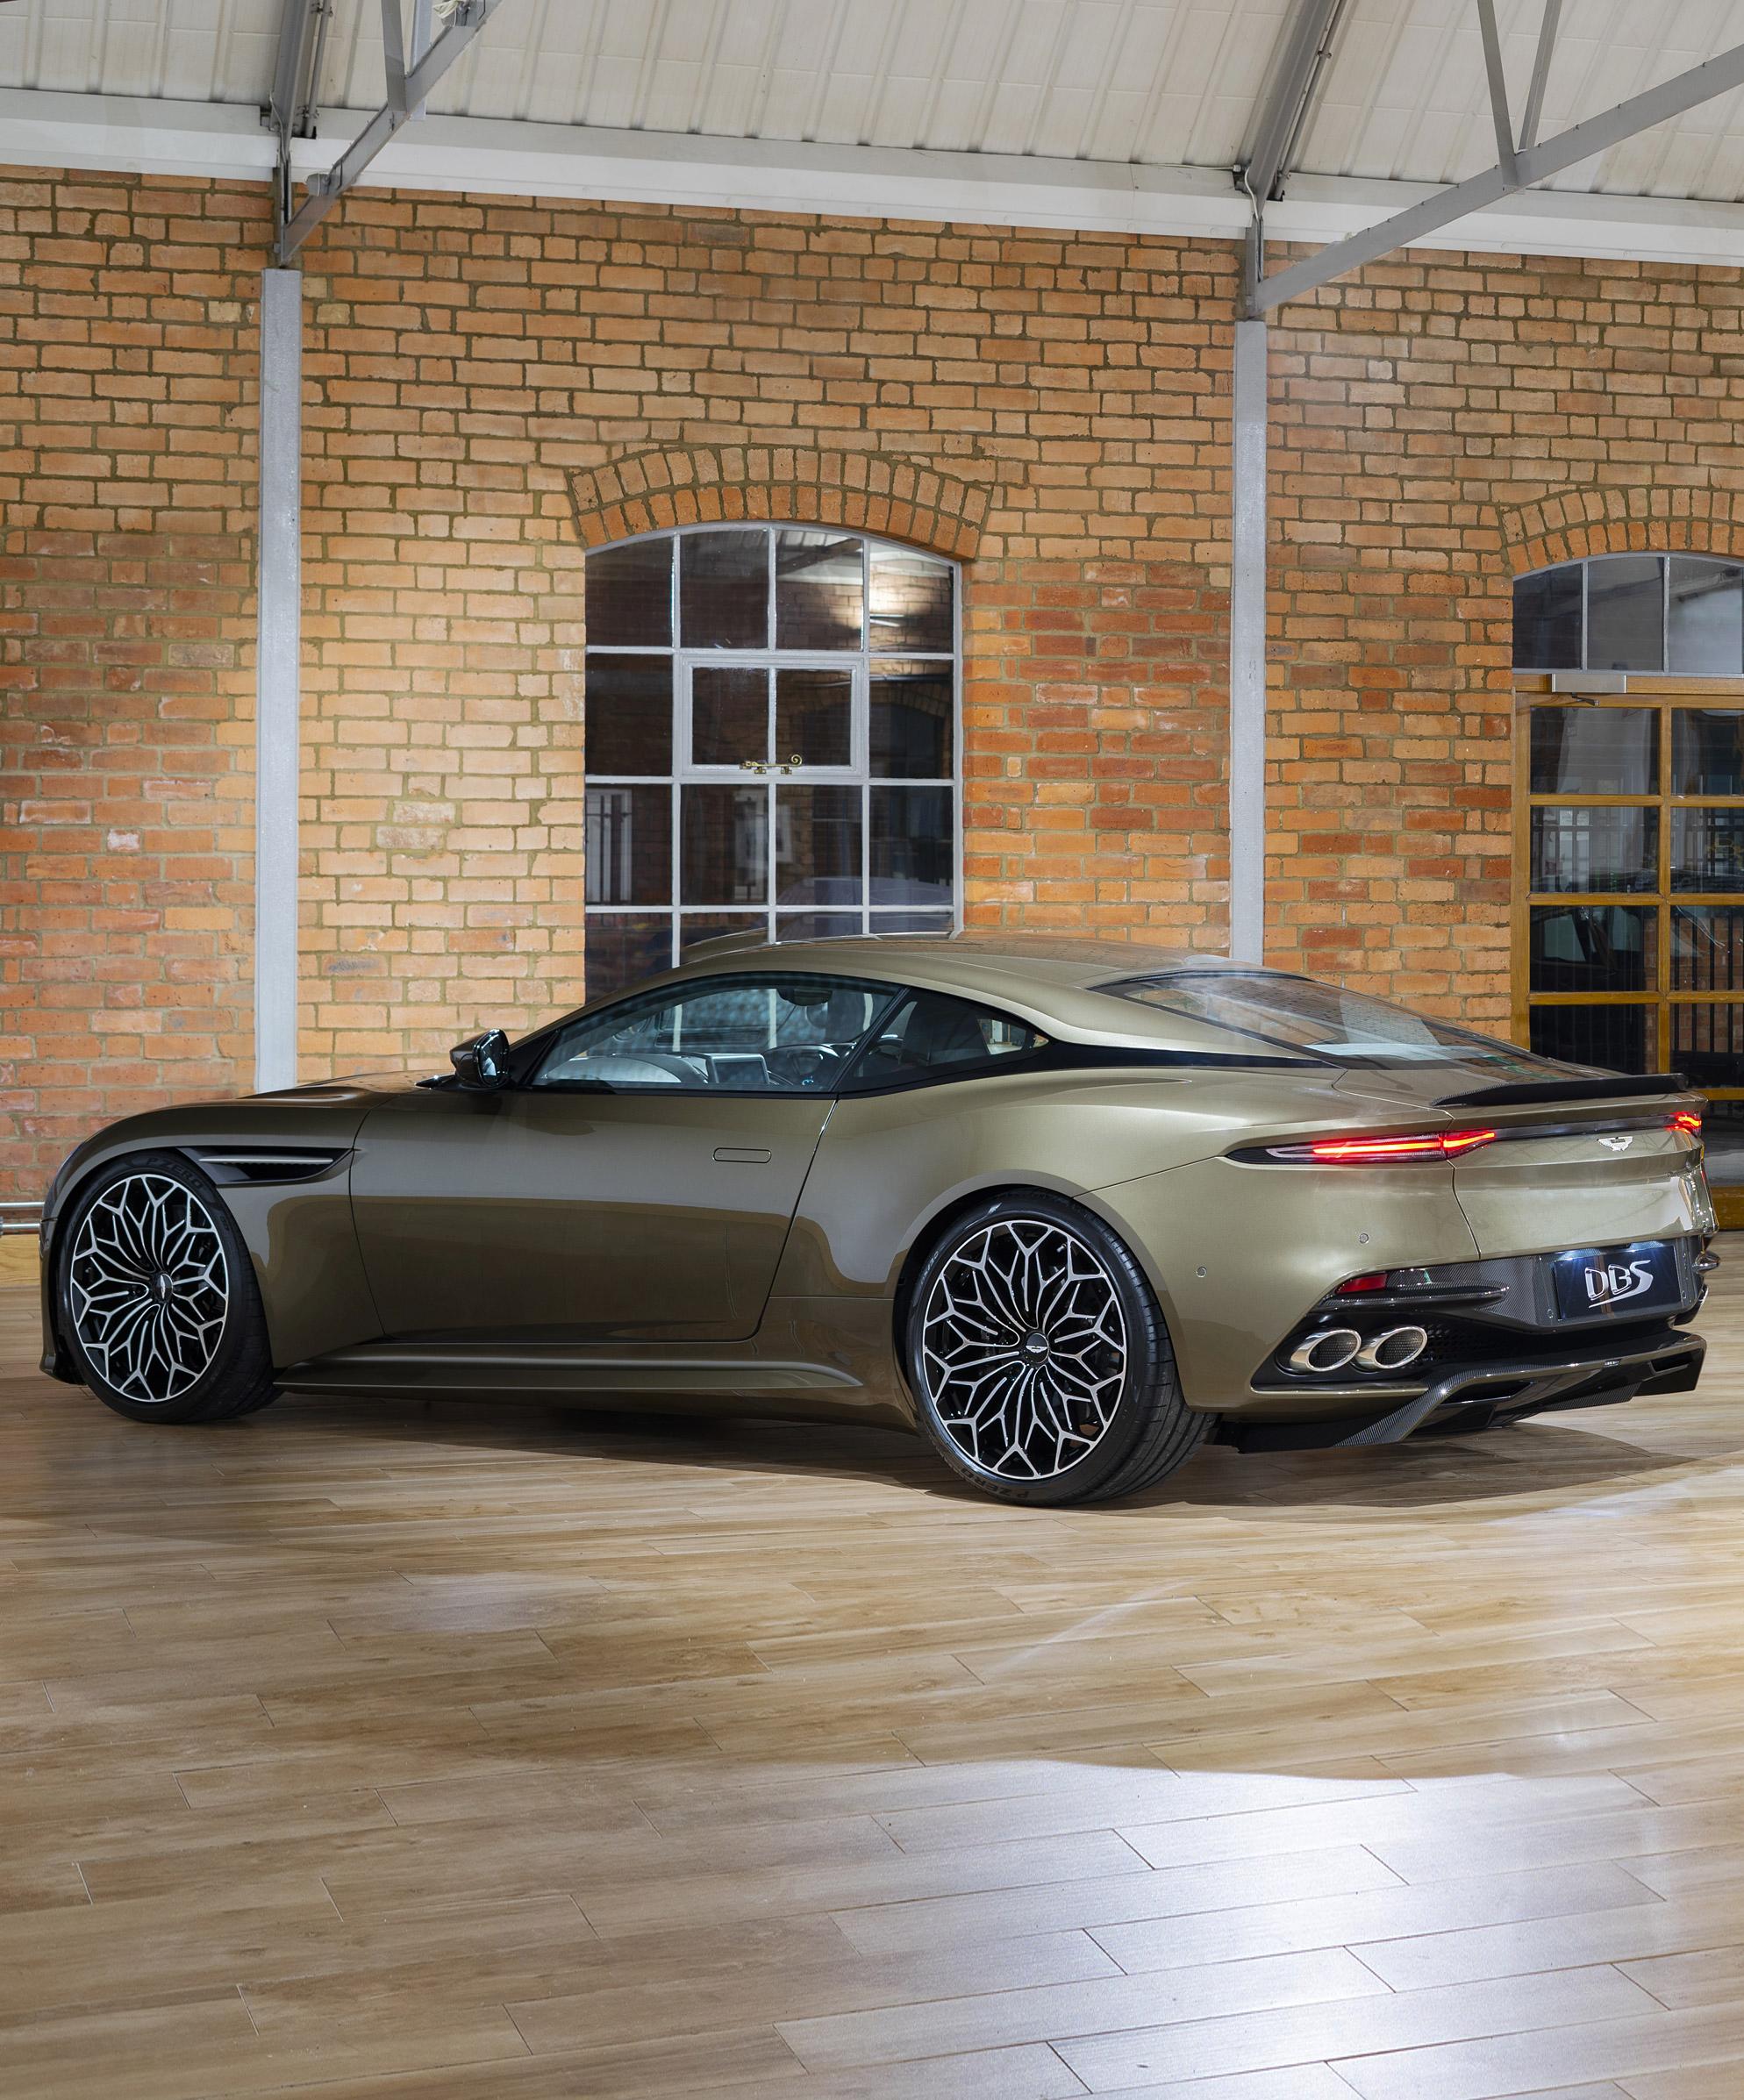 2019 Aston Martin Dbs Superleggera Ohmss Edition Looks Stunning The Man Aston Martin Dbs Aston Martin Cars Super Luxury Cars